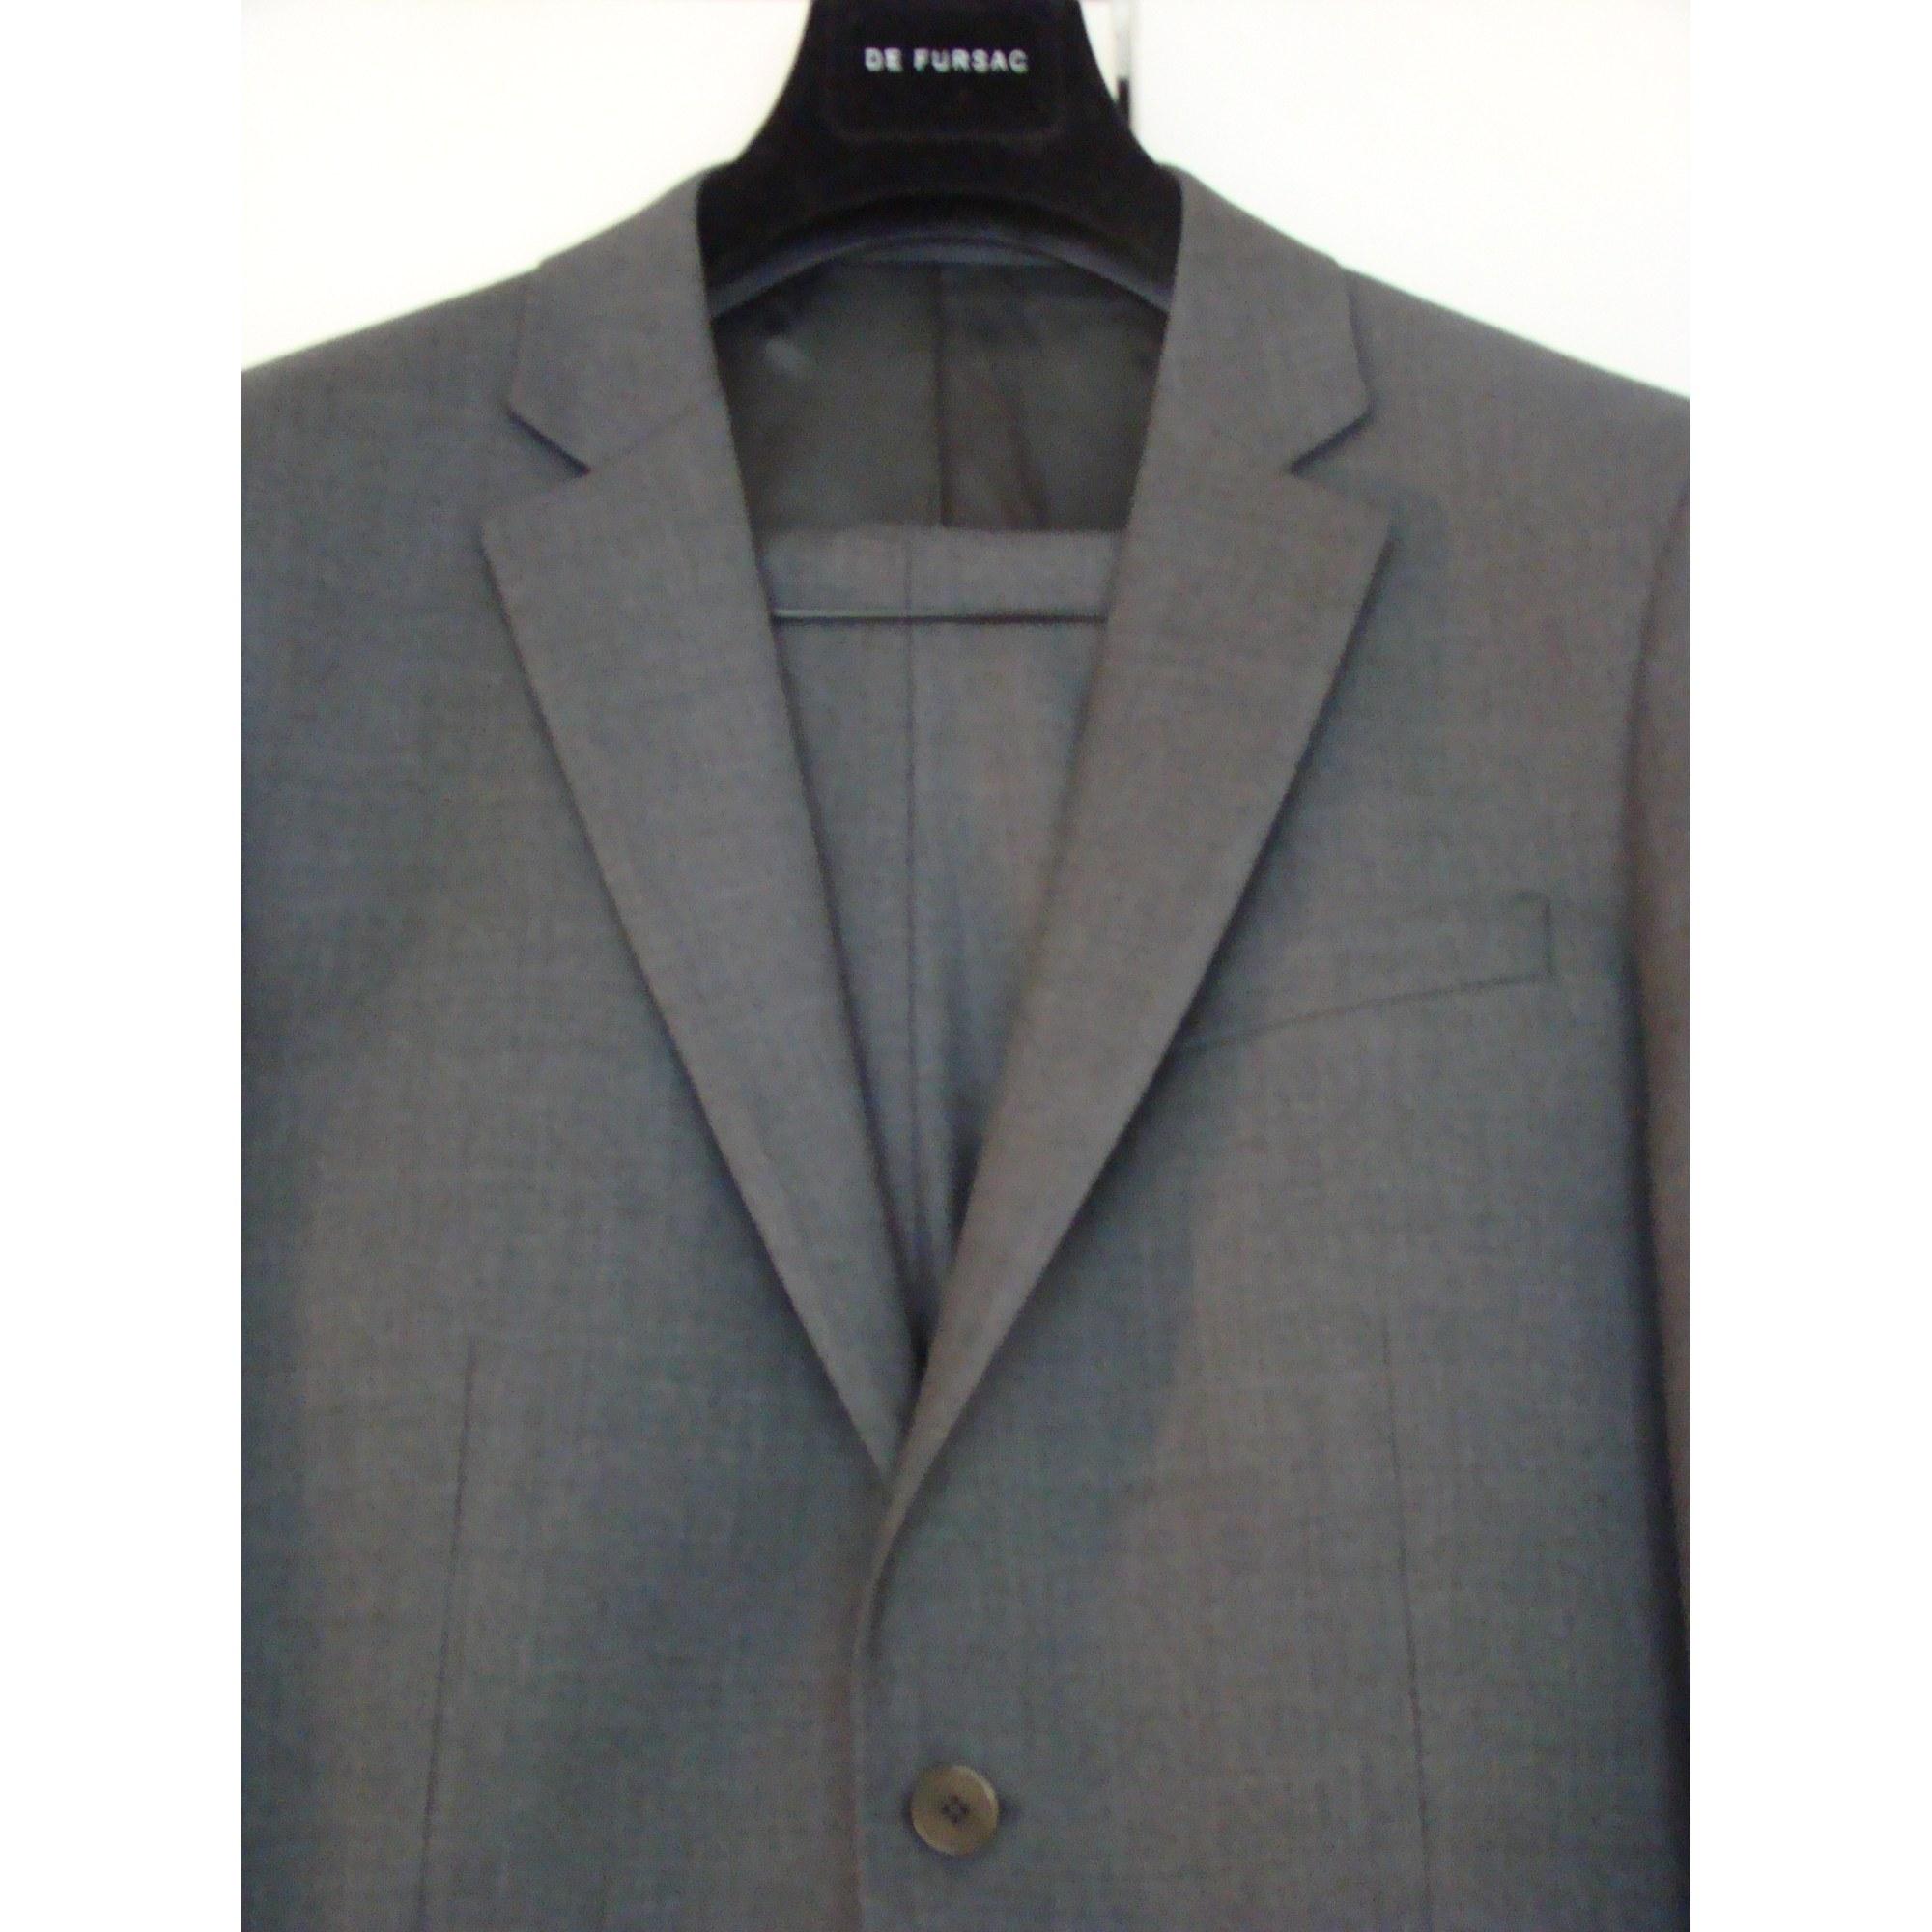 e32b015cef13 Costume complet DE FURSAC 46 (S) gris vendu par Shopname149190 - 622765